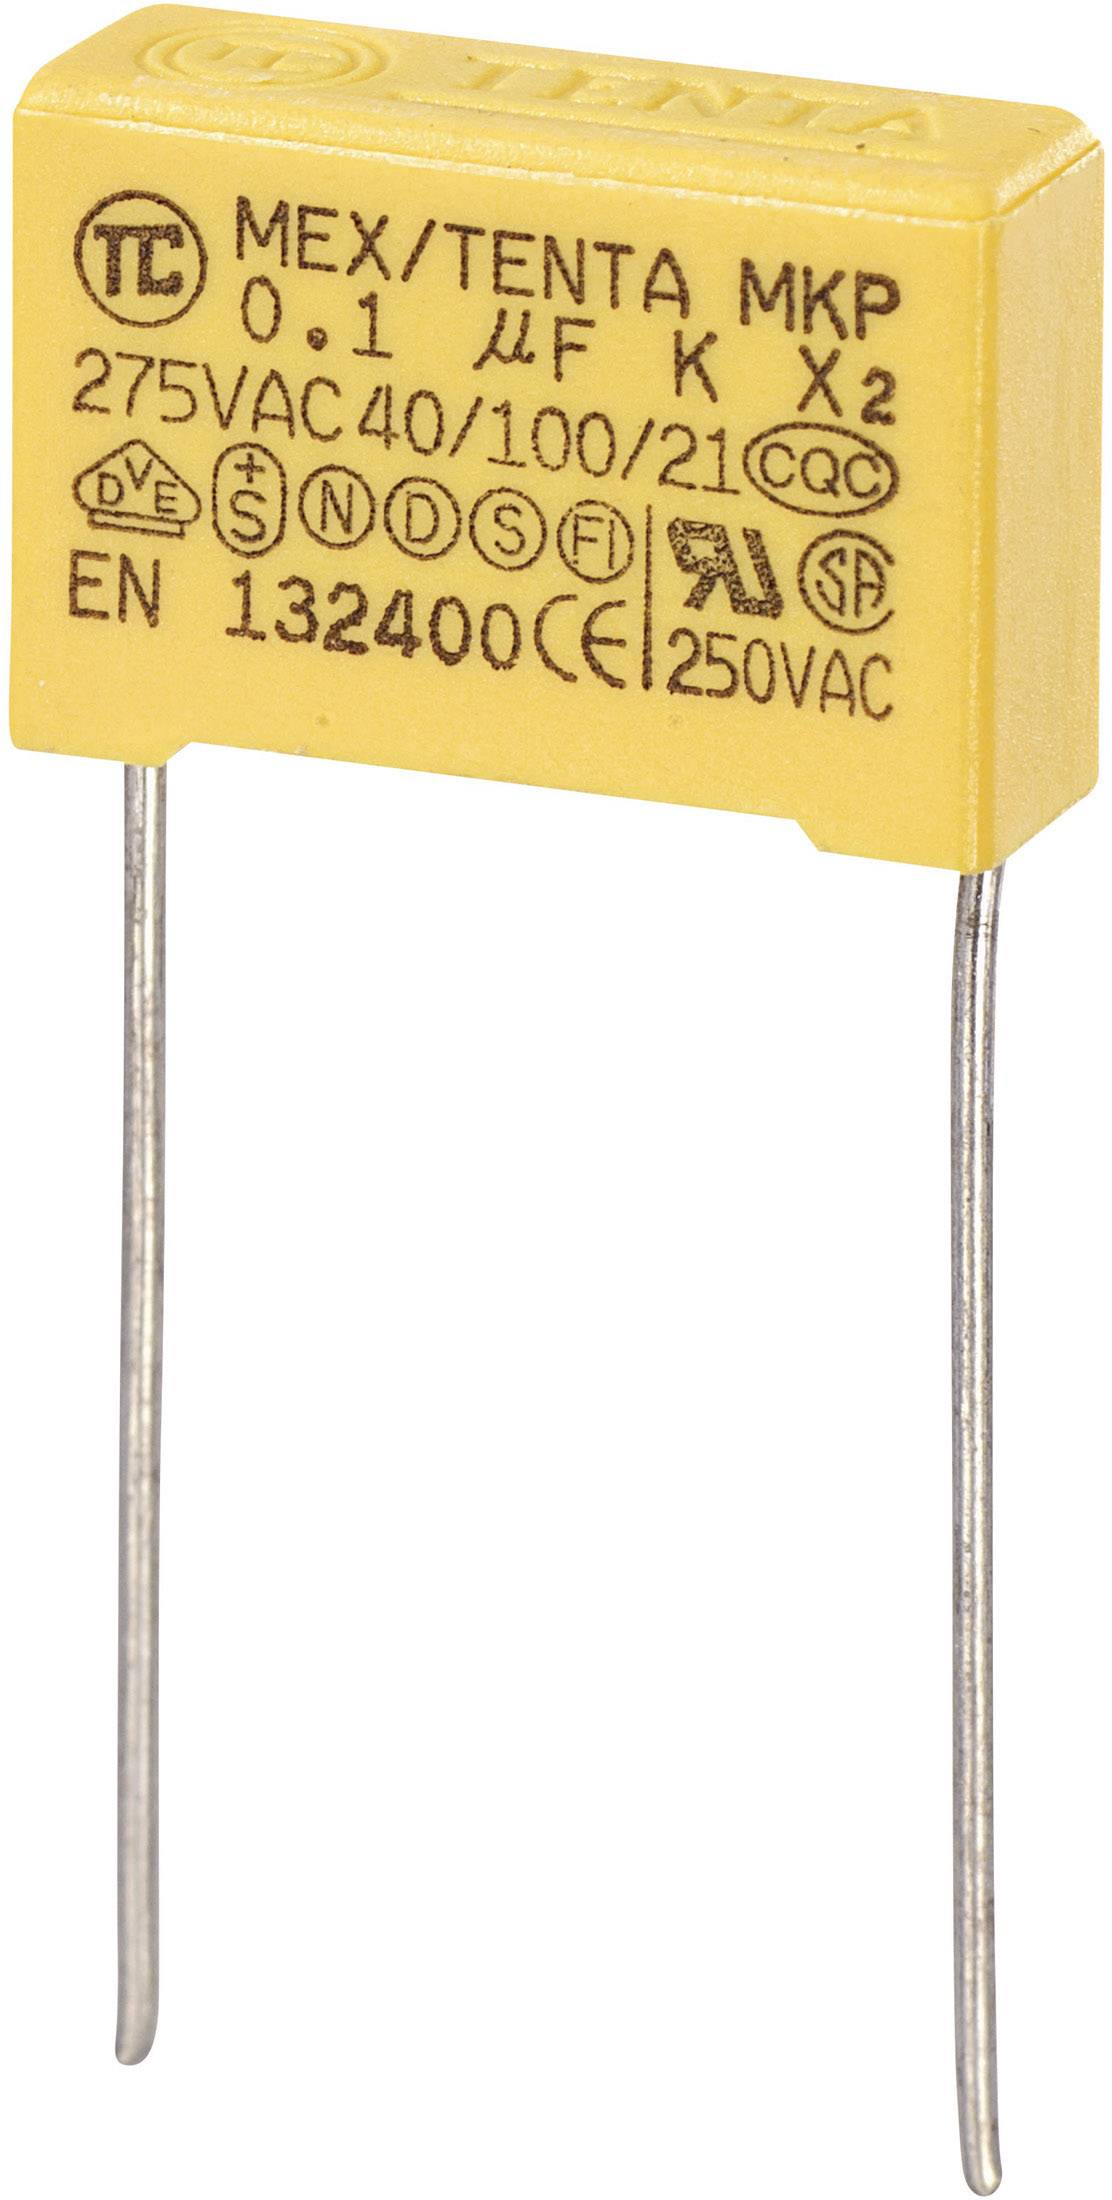 Foliový kondenzátor MKP, 0,15 µF, X2 275 V/AC, 10 %, 18 x 6 x 12 mm